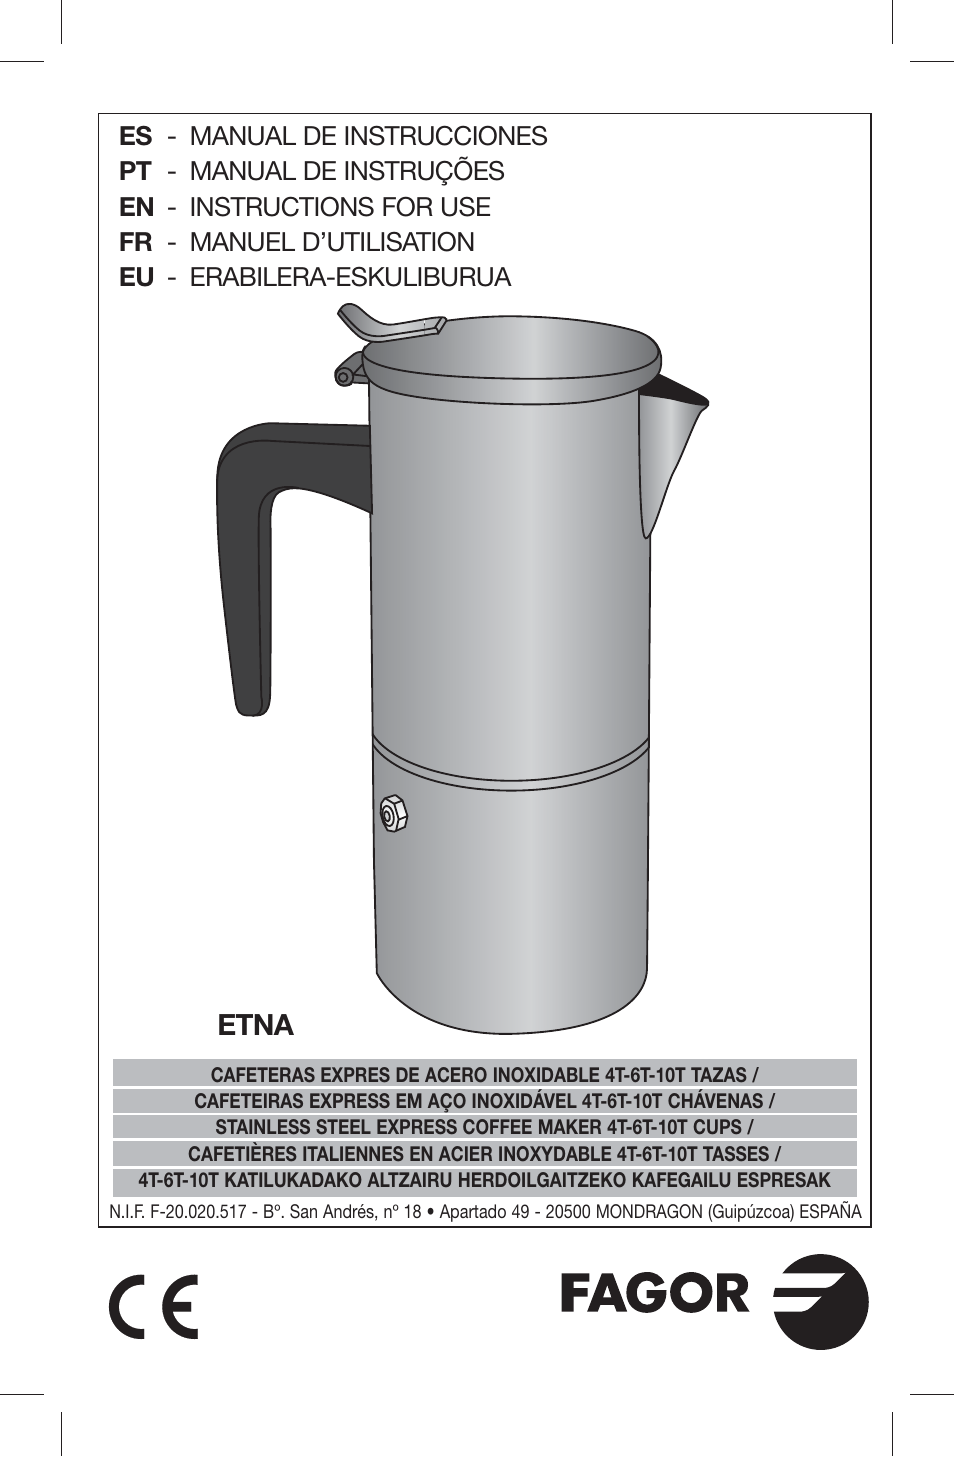 Fagor Etna 10 6 Y 4 Tazas User Manual 8 Pages